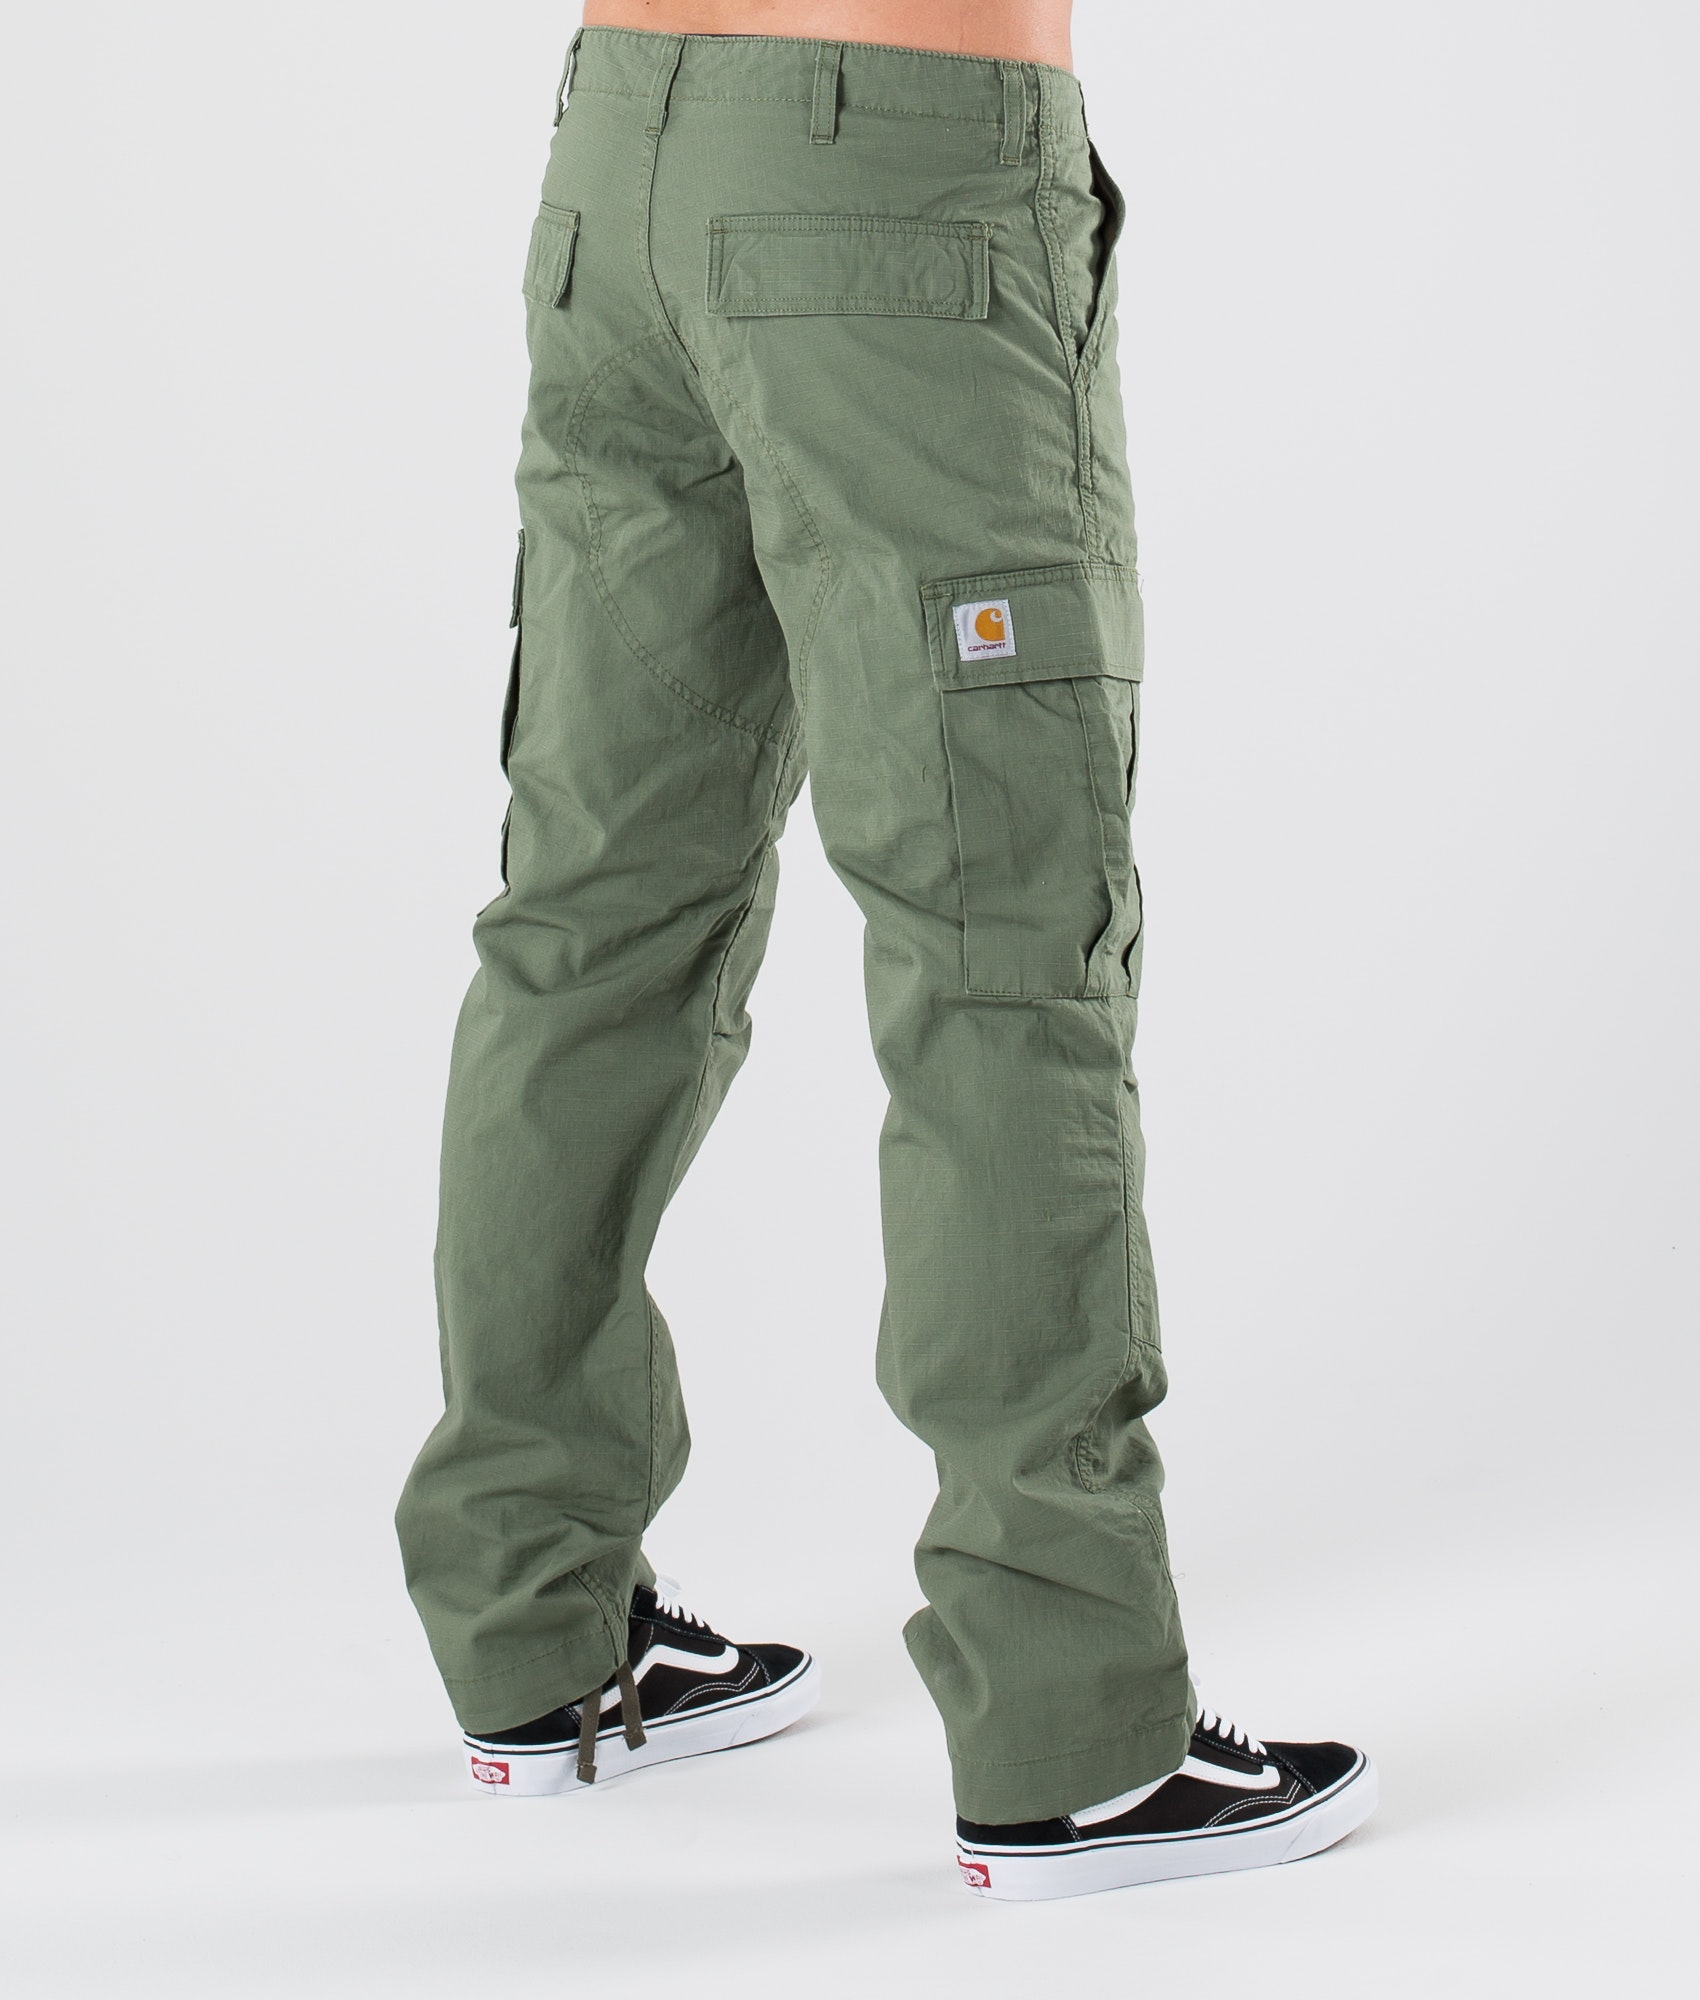 Carhartt Regular Cargo Pant Pantalon